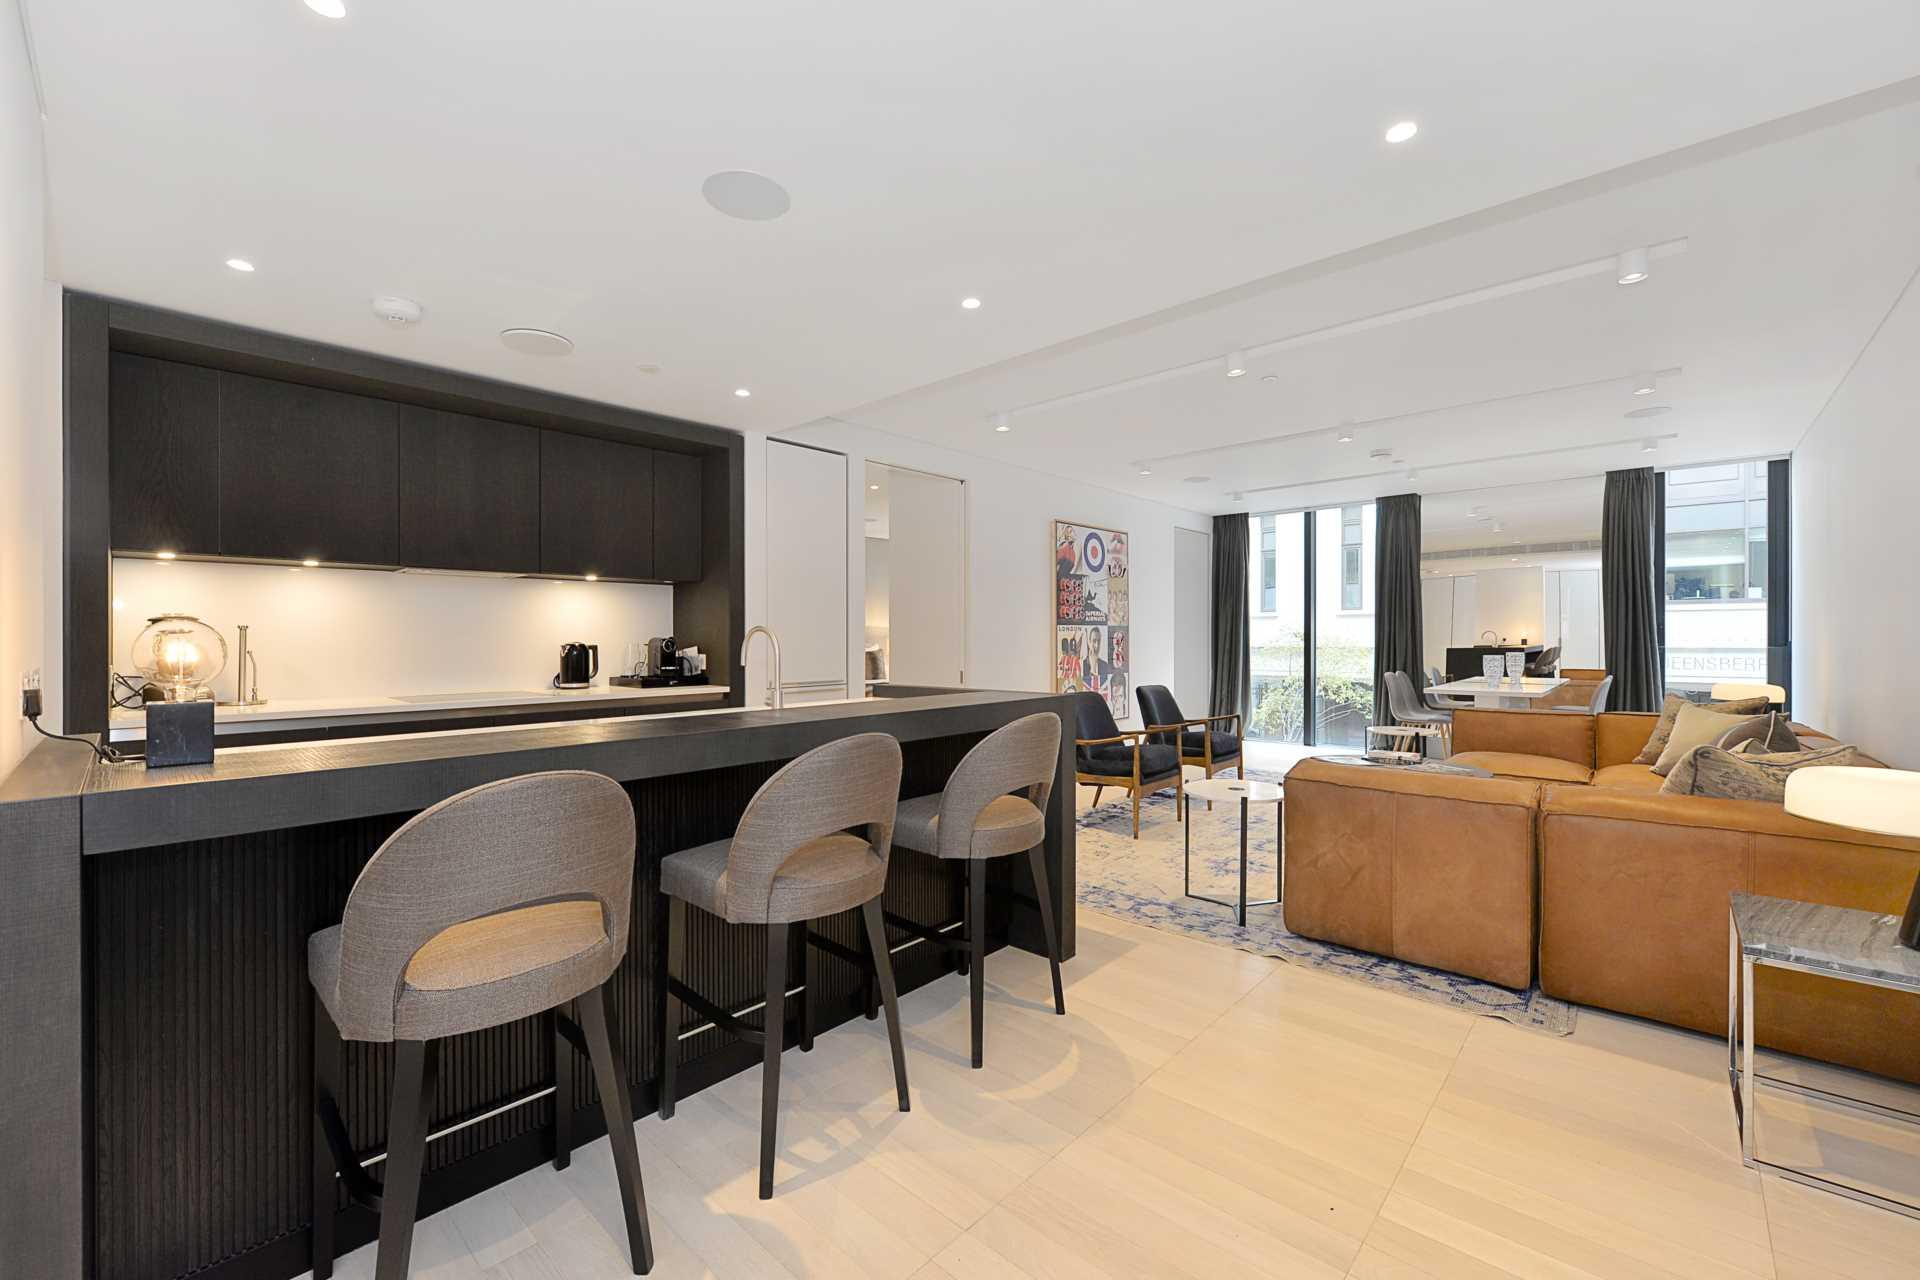 2 Bedroom Apartment For Sale Burlington Gate Cork Street Mayfair London W1s 3nb